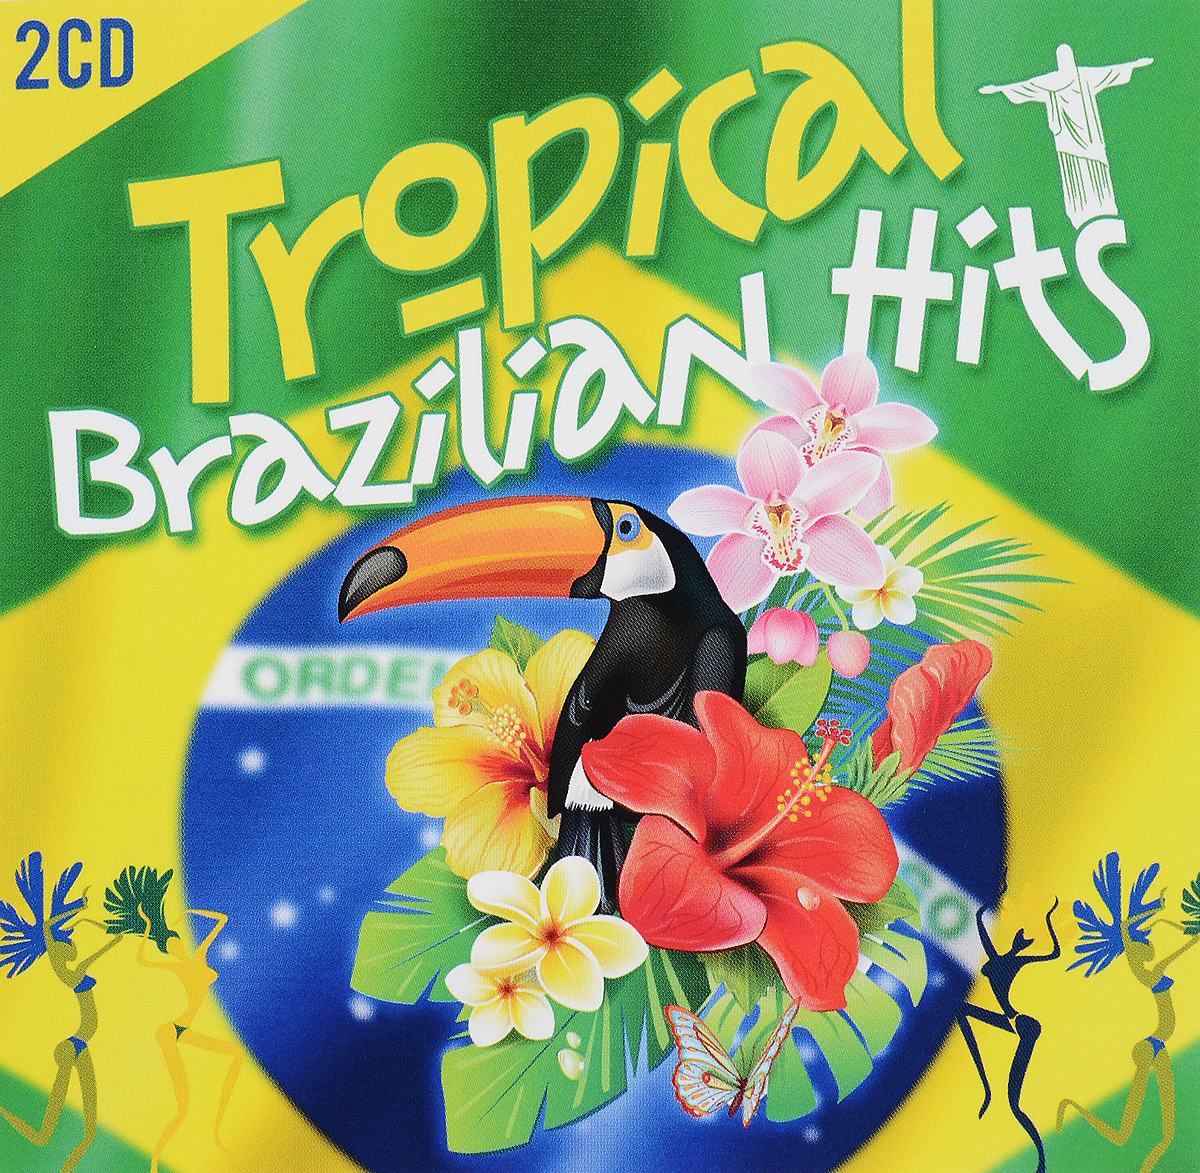 Луиса Коста,Джо Висент,Оливия Оливейра,Лусио де Фрейтас,Grupo Da Costa Tropical Brazilian Hits (2 CD) grupo de noche